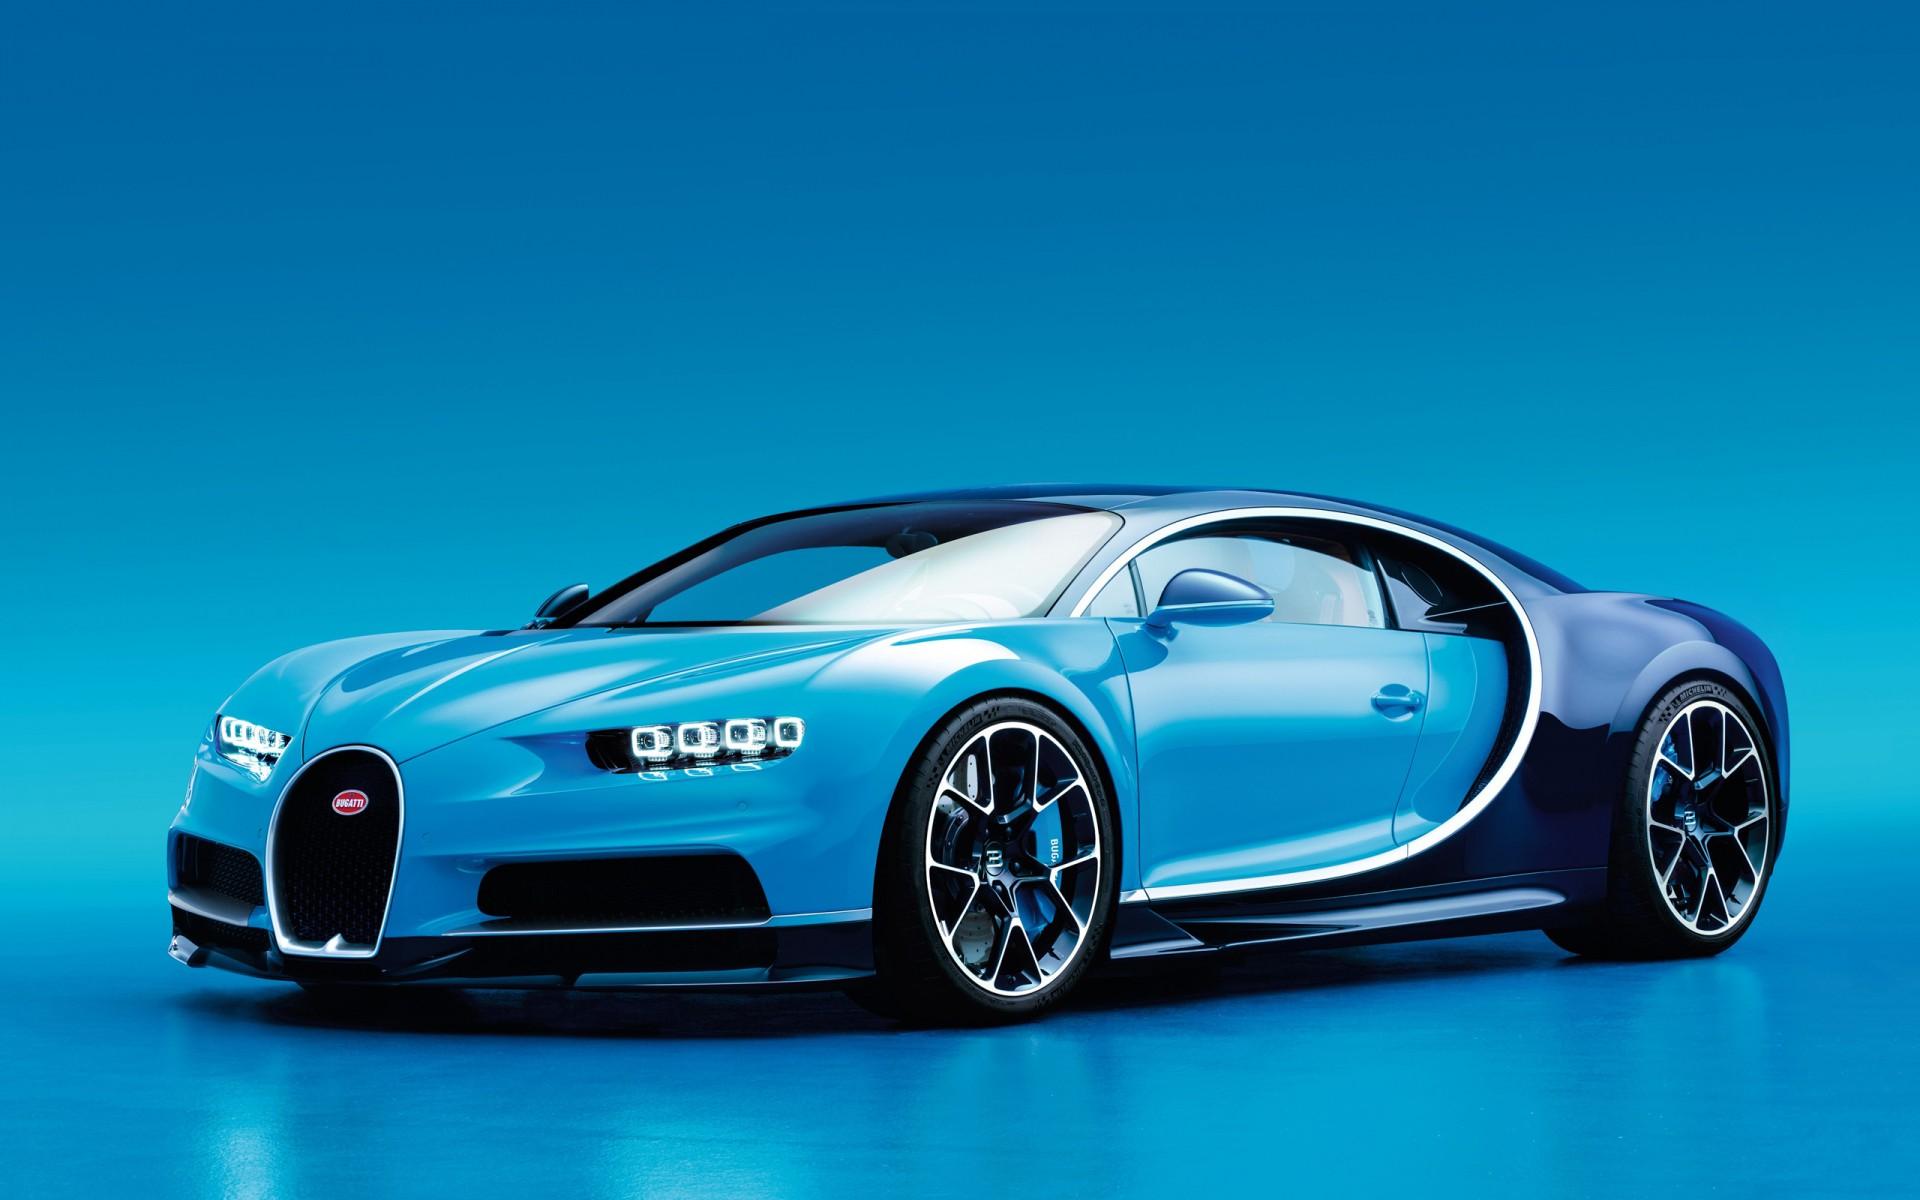 Bugatti Veyron Hd Wallpapers 2013 2017 Bugatti Chiron 2 Wallpaper Hd Car Wallpapers Id 6275